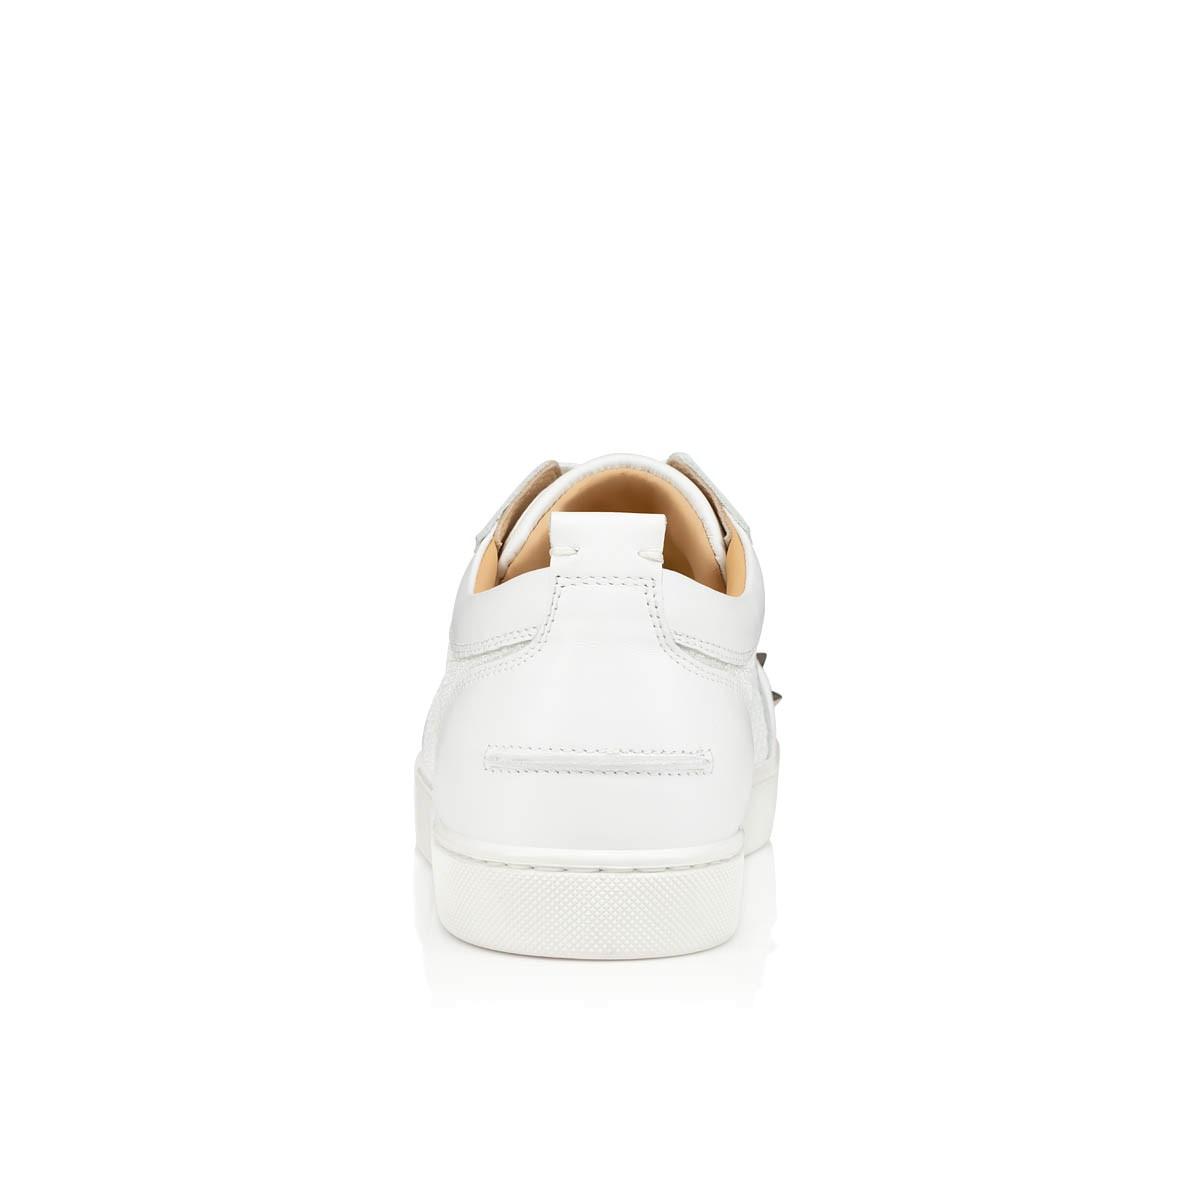 Shoes - Ac Louis Junior Spikes Woman - Christian Louboutin